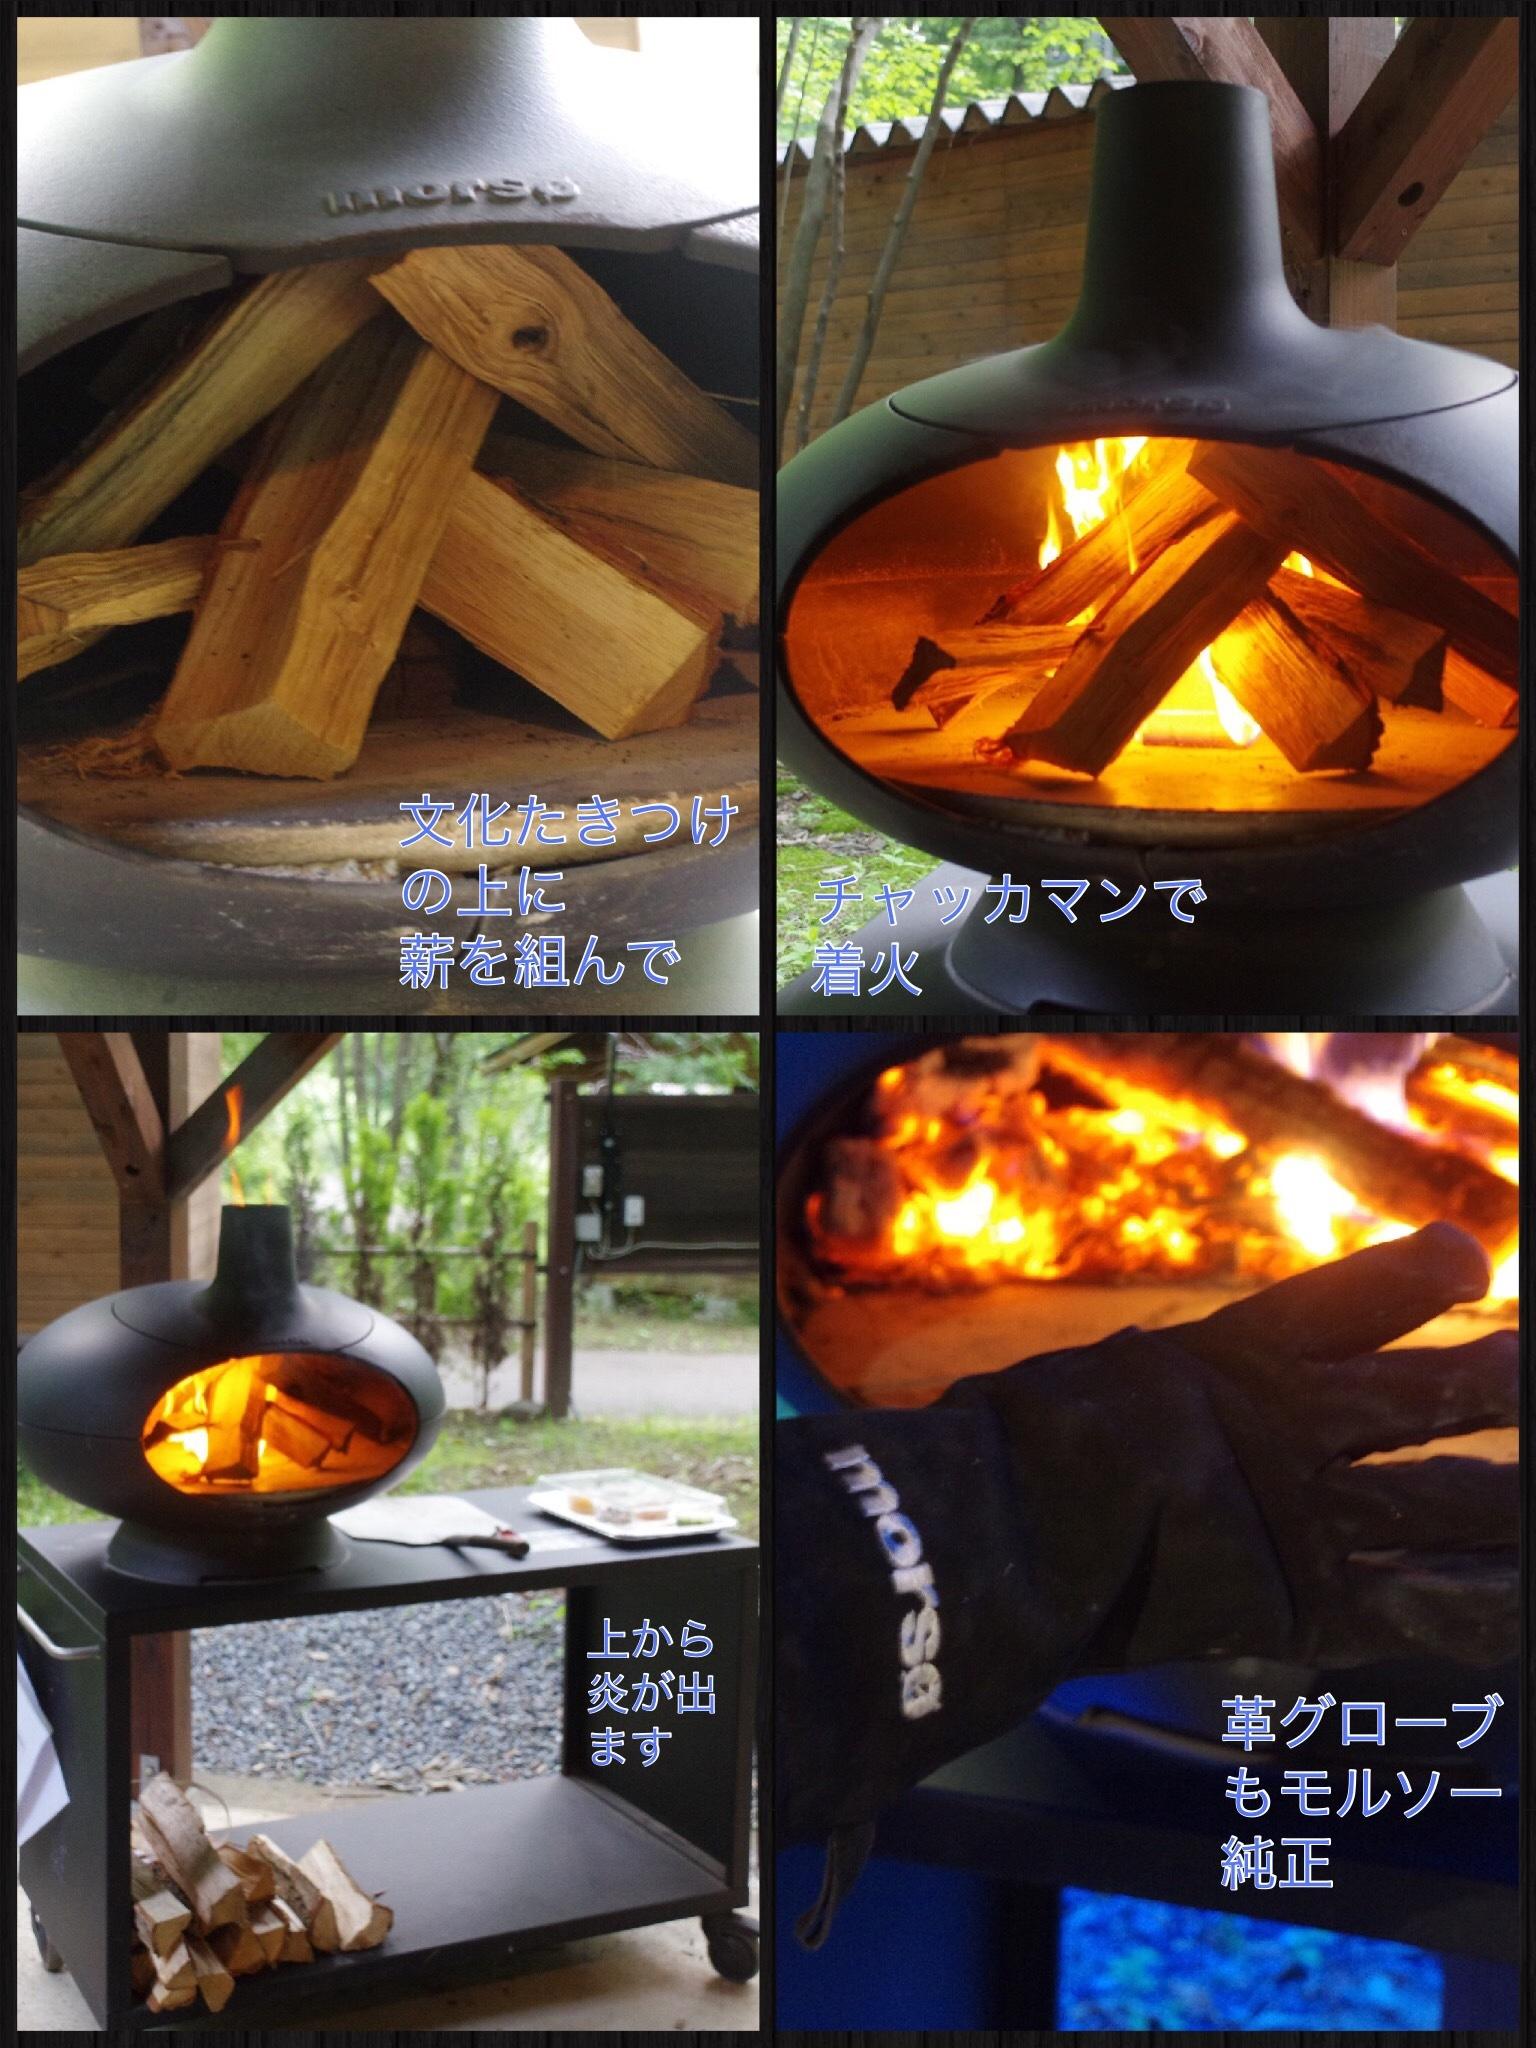 「PICA秩父グランオーベルジュコテージ」宿泊記 釜焼きピザ BBQ